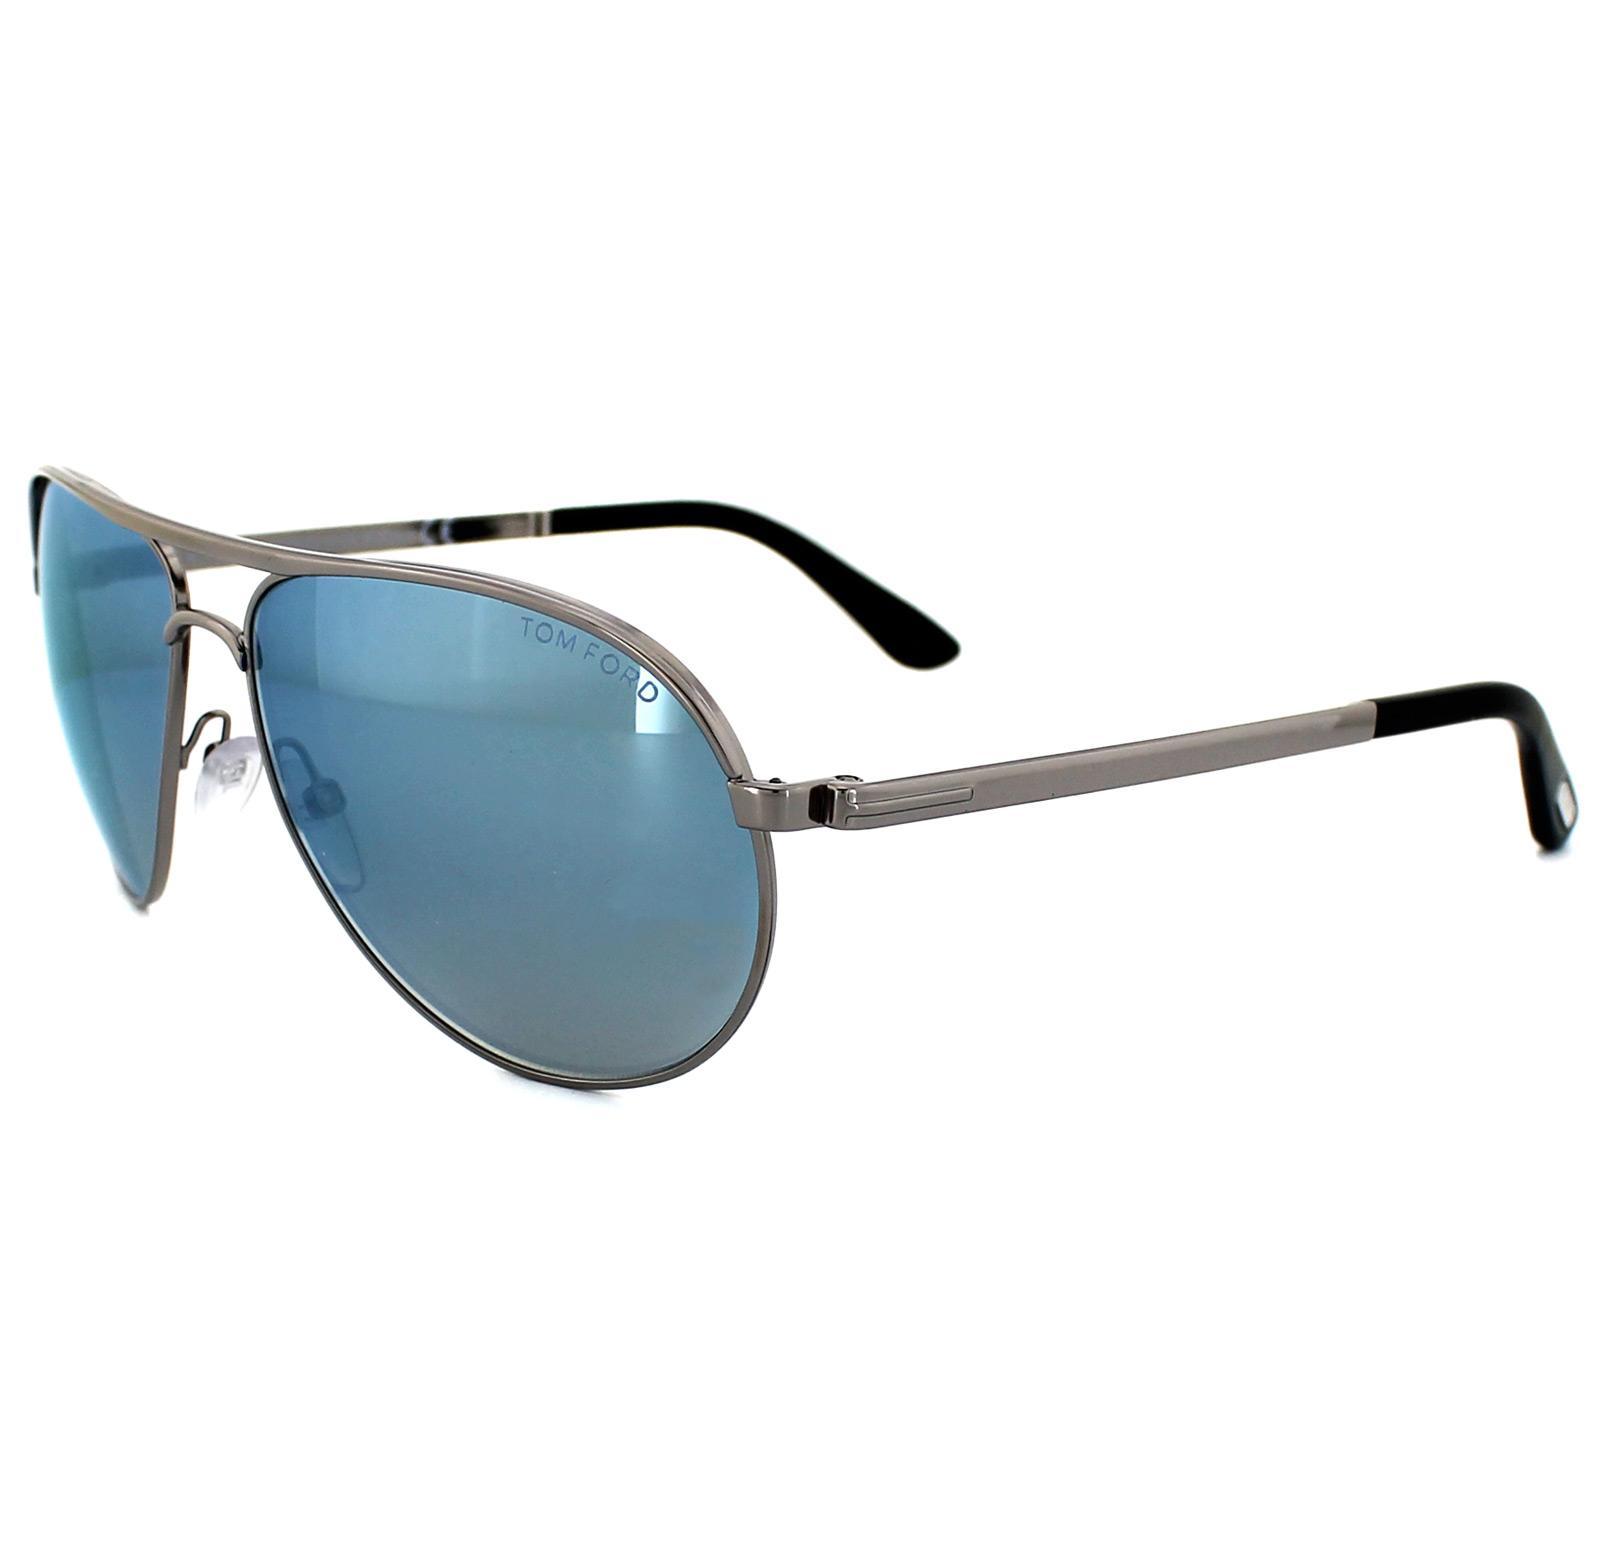 771c14a938a Cheap Tom Ford 0144 Marko Sunglasses - Discounted Sunglasses